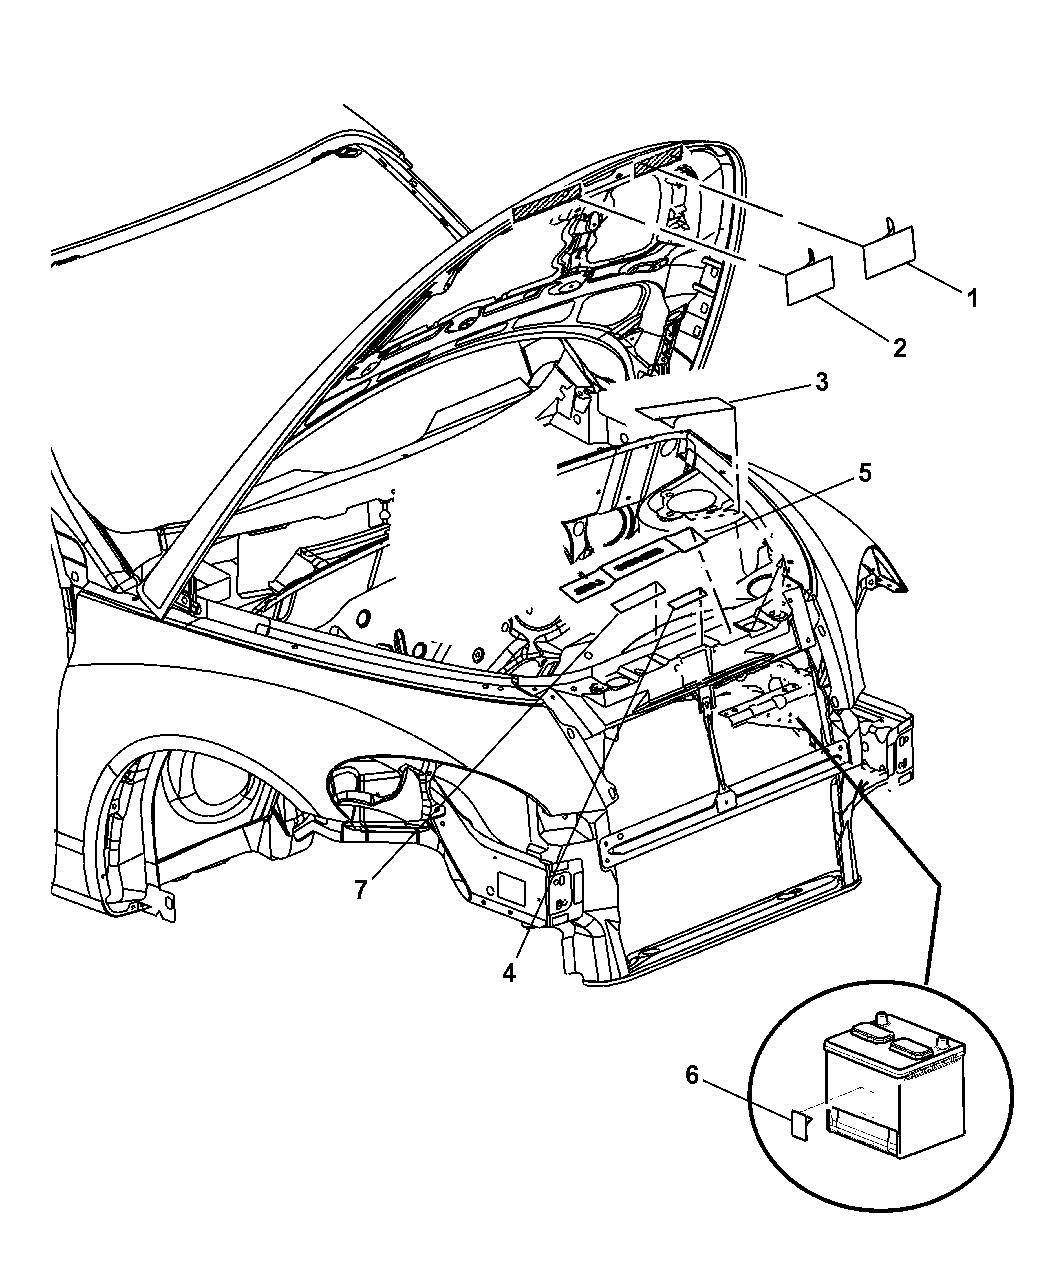 2004 Chrysler PT Cruiser Engine Compartment